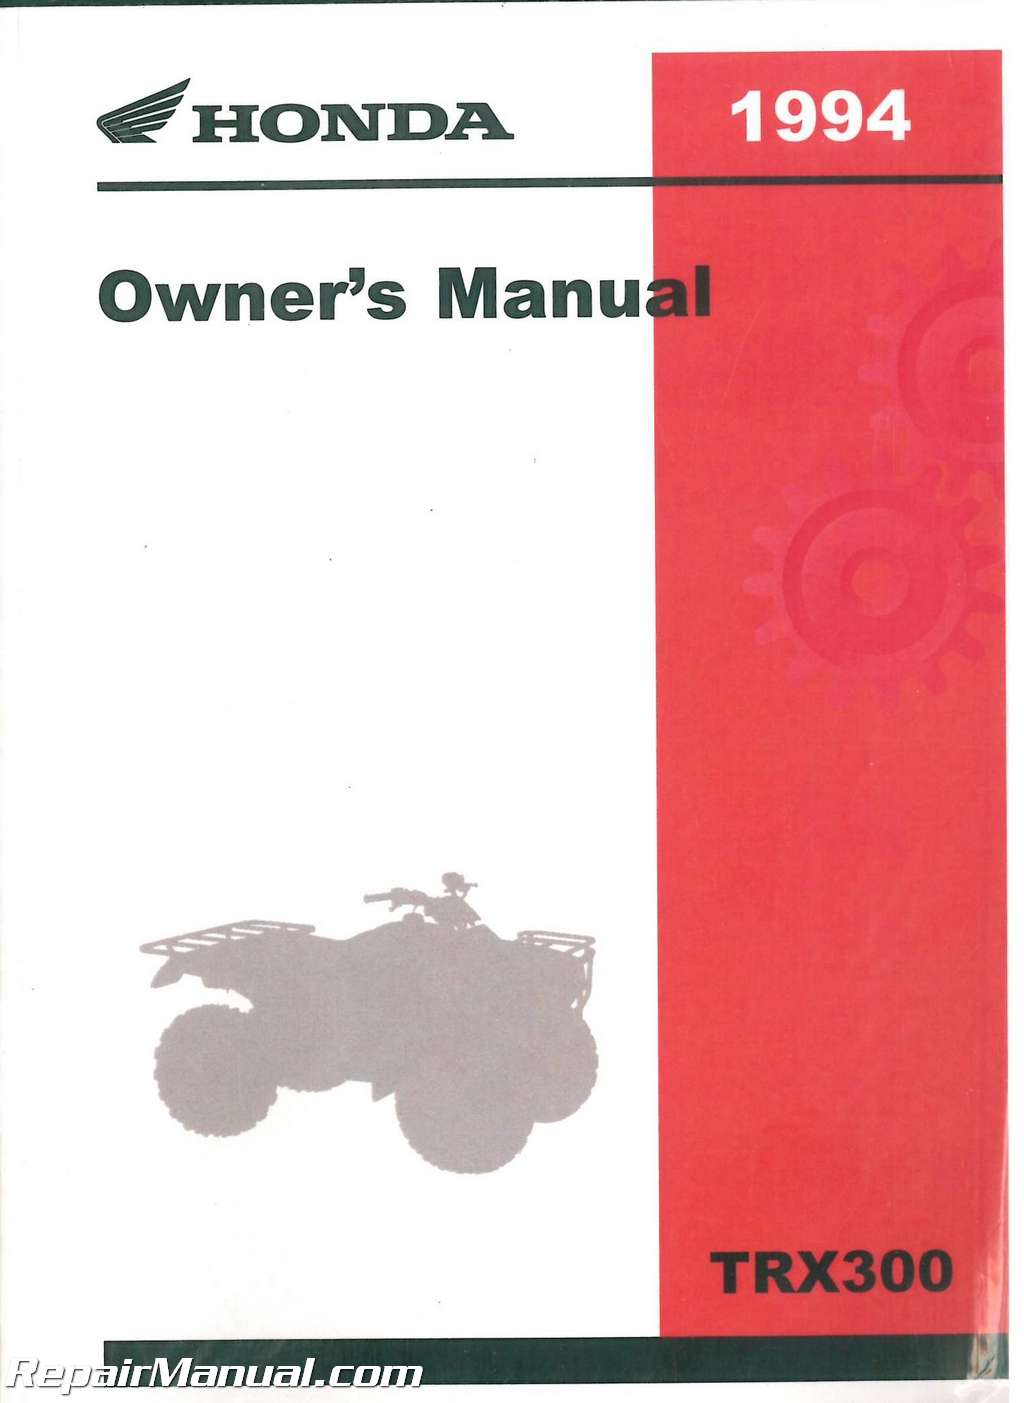 1994 honda trx300 fourtrax 300 atv owners manual rh repairmanual com honda atv owners manual download atv owners manual downloads